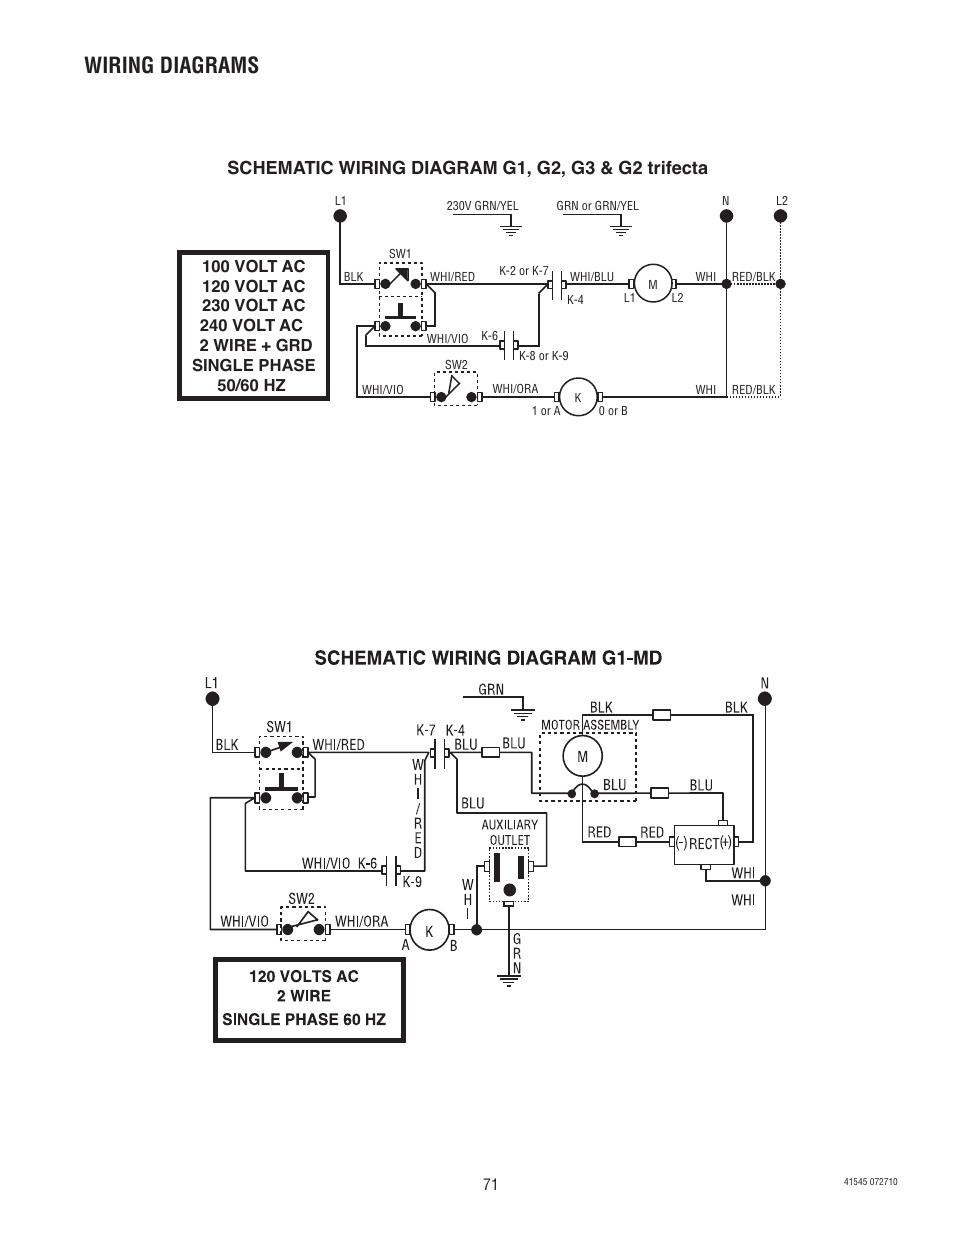 Wiring Diagrams Bunn G9 2t Dbc User Manual Page 71 79 Single Diagram